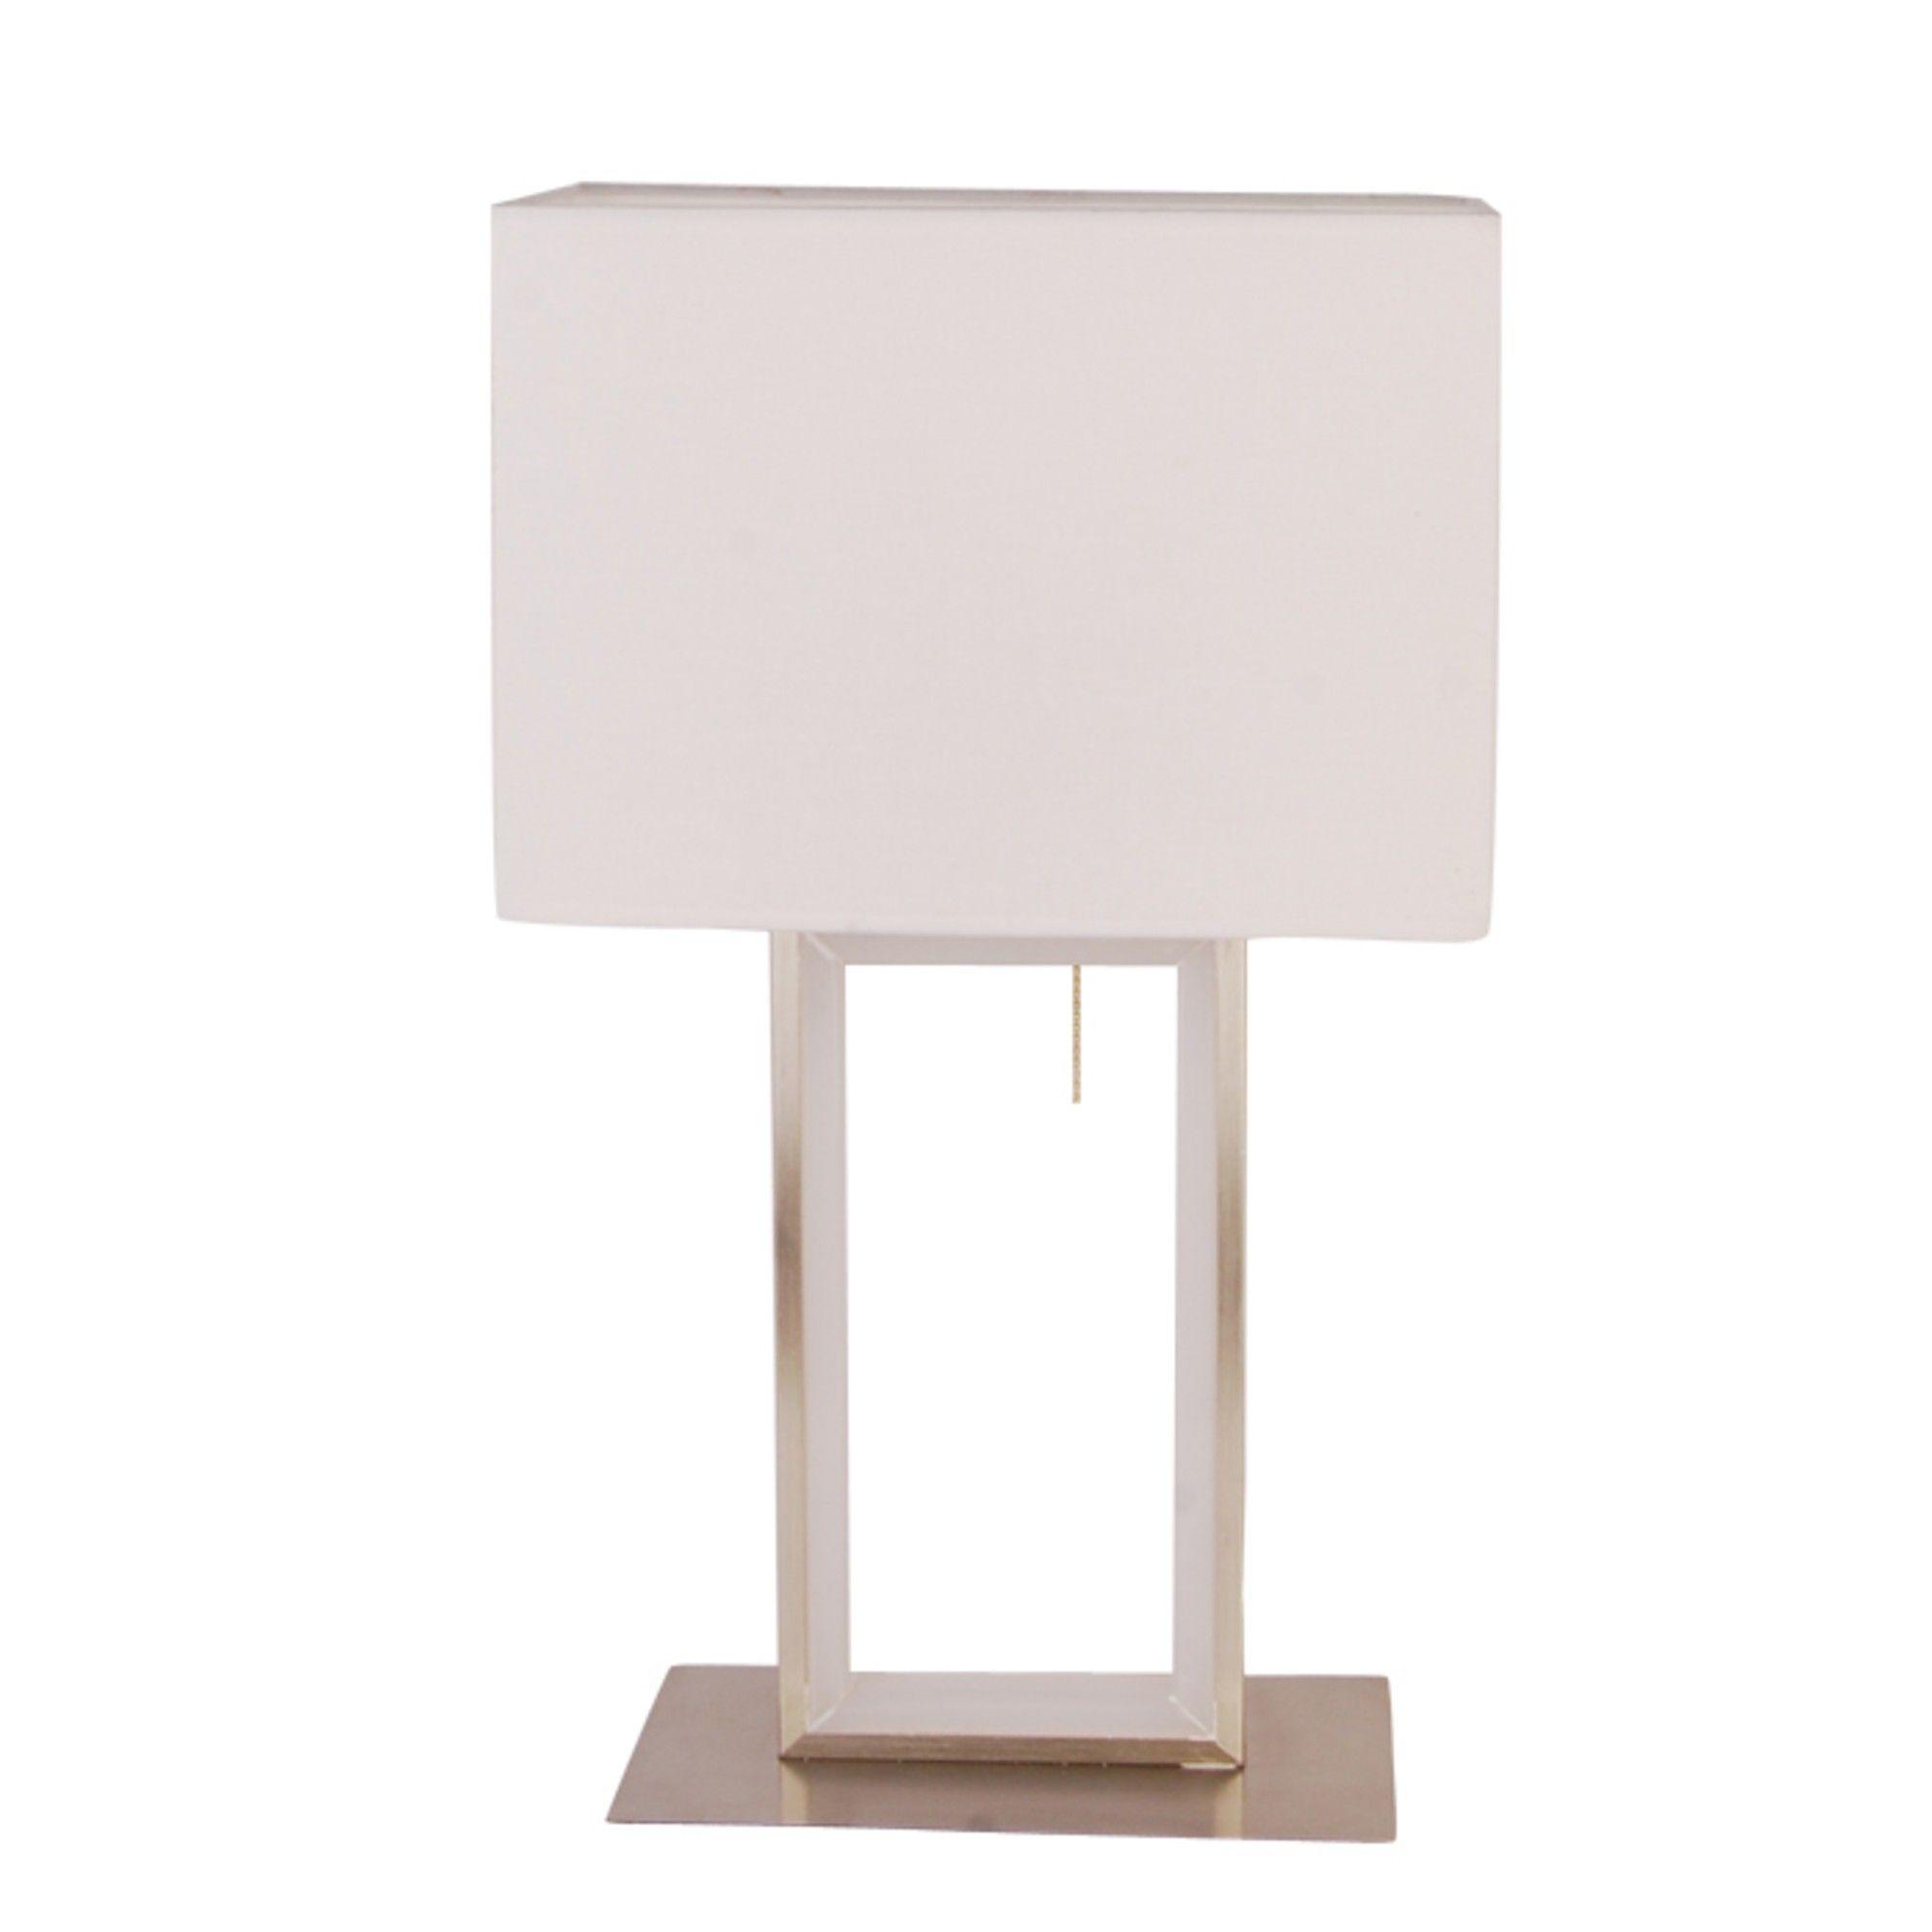 Ulari Warm White LED 43.5cm Satin Nickel Table Lamp